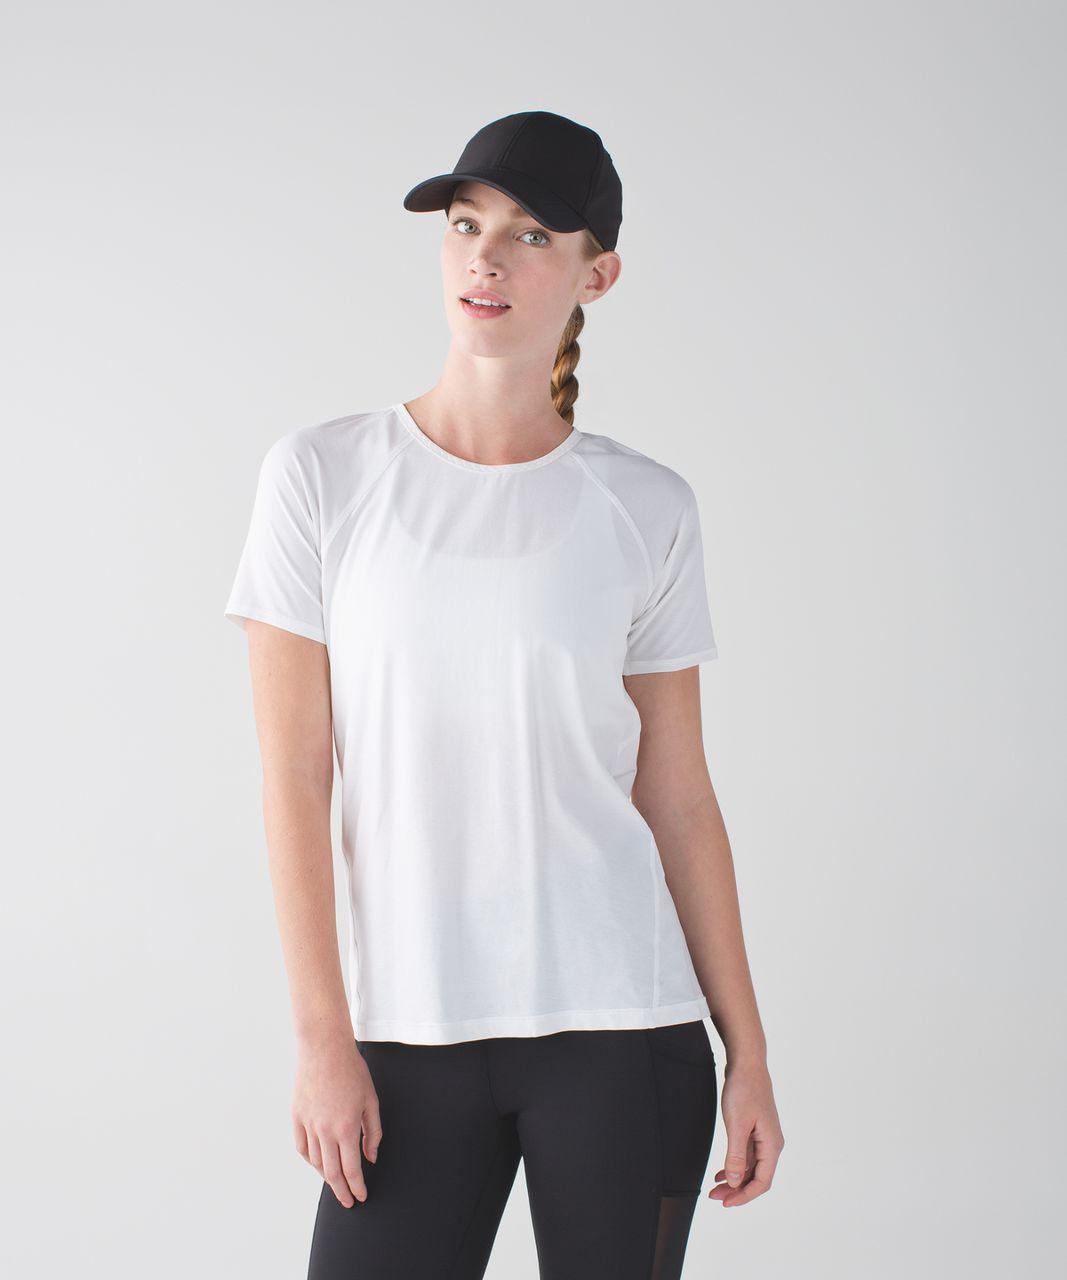 Lululemon Baller Hat - Black / Heathered Slate